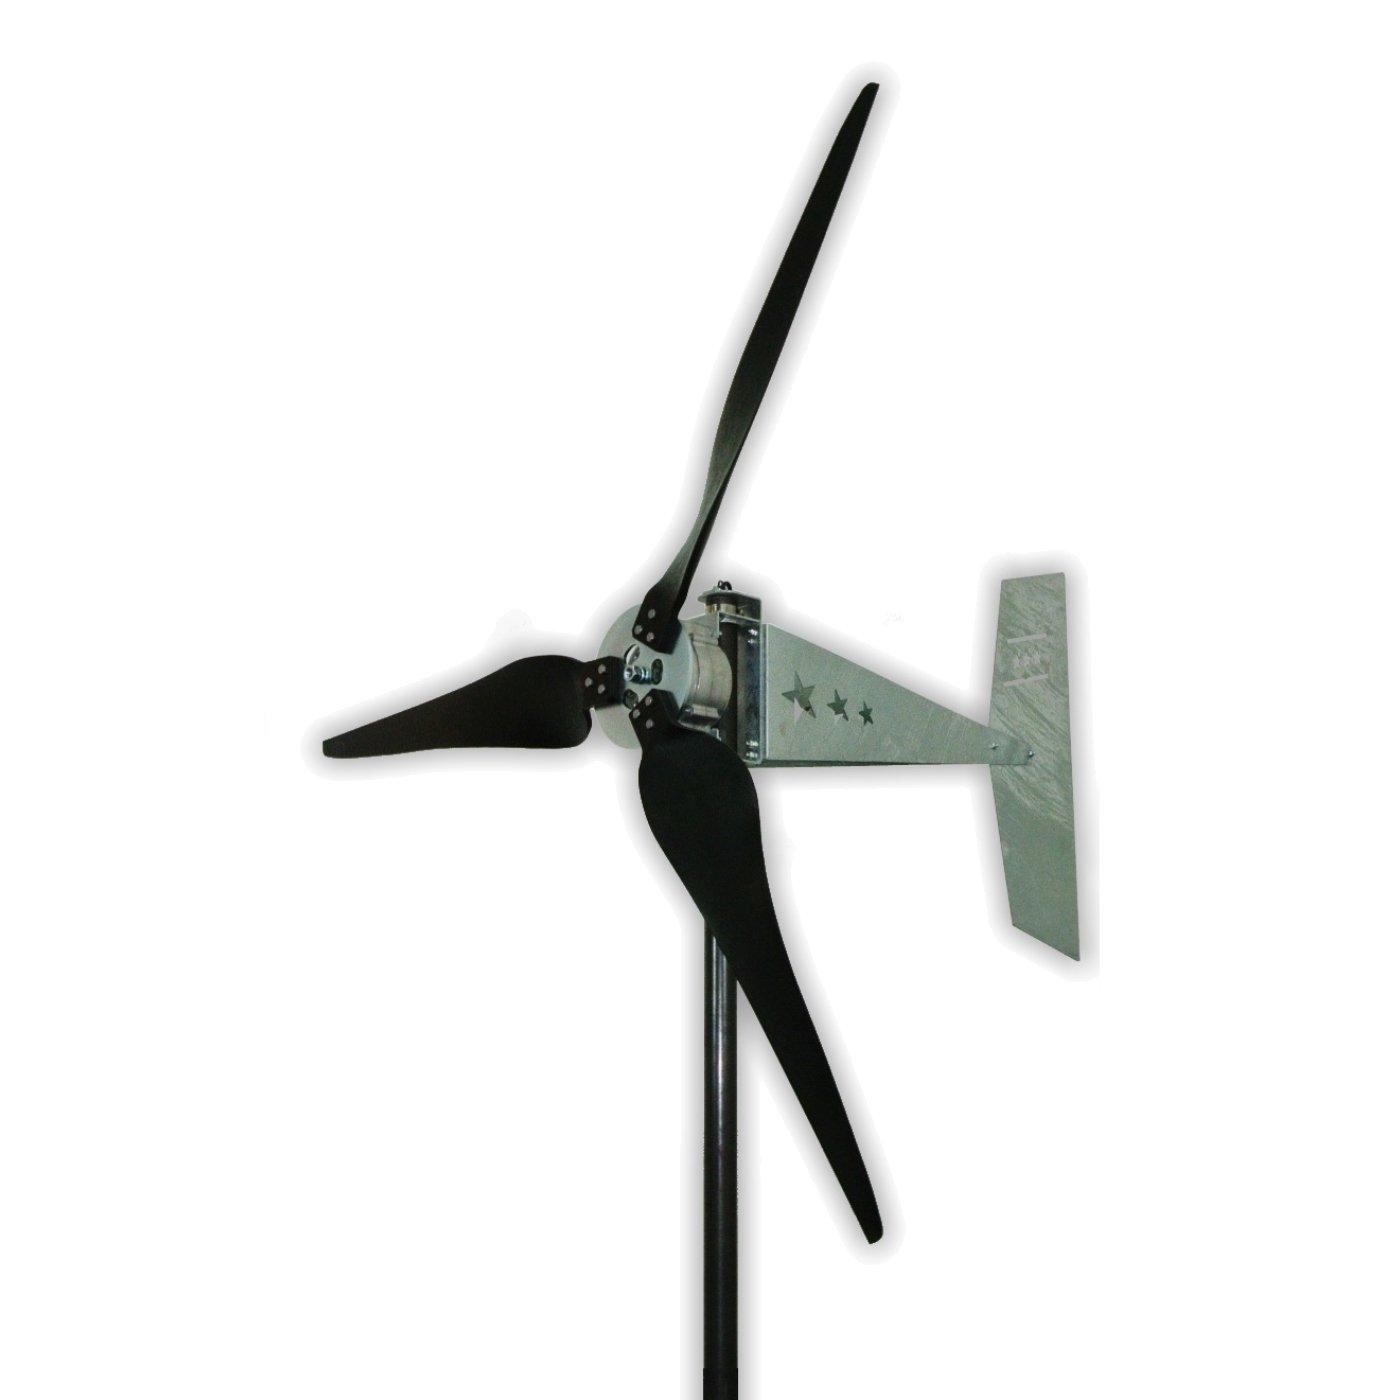 Amazon 24 Volt 1600 Watt Three Blade Missouri Wind and Solar